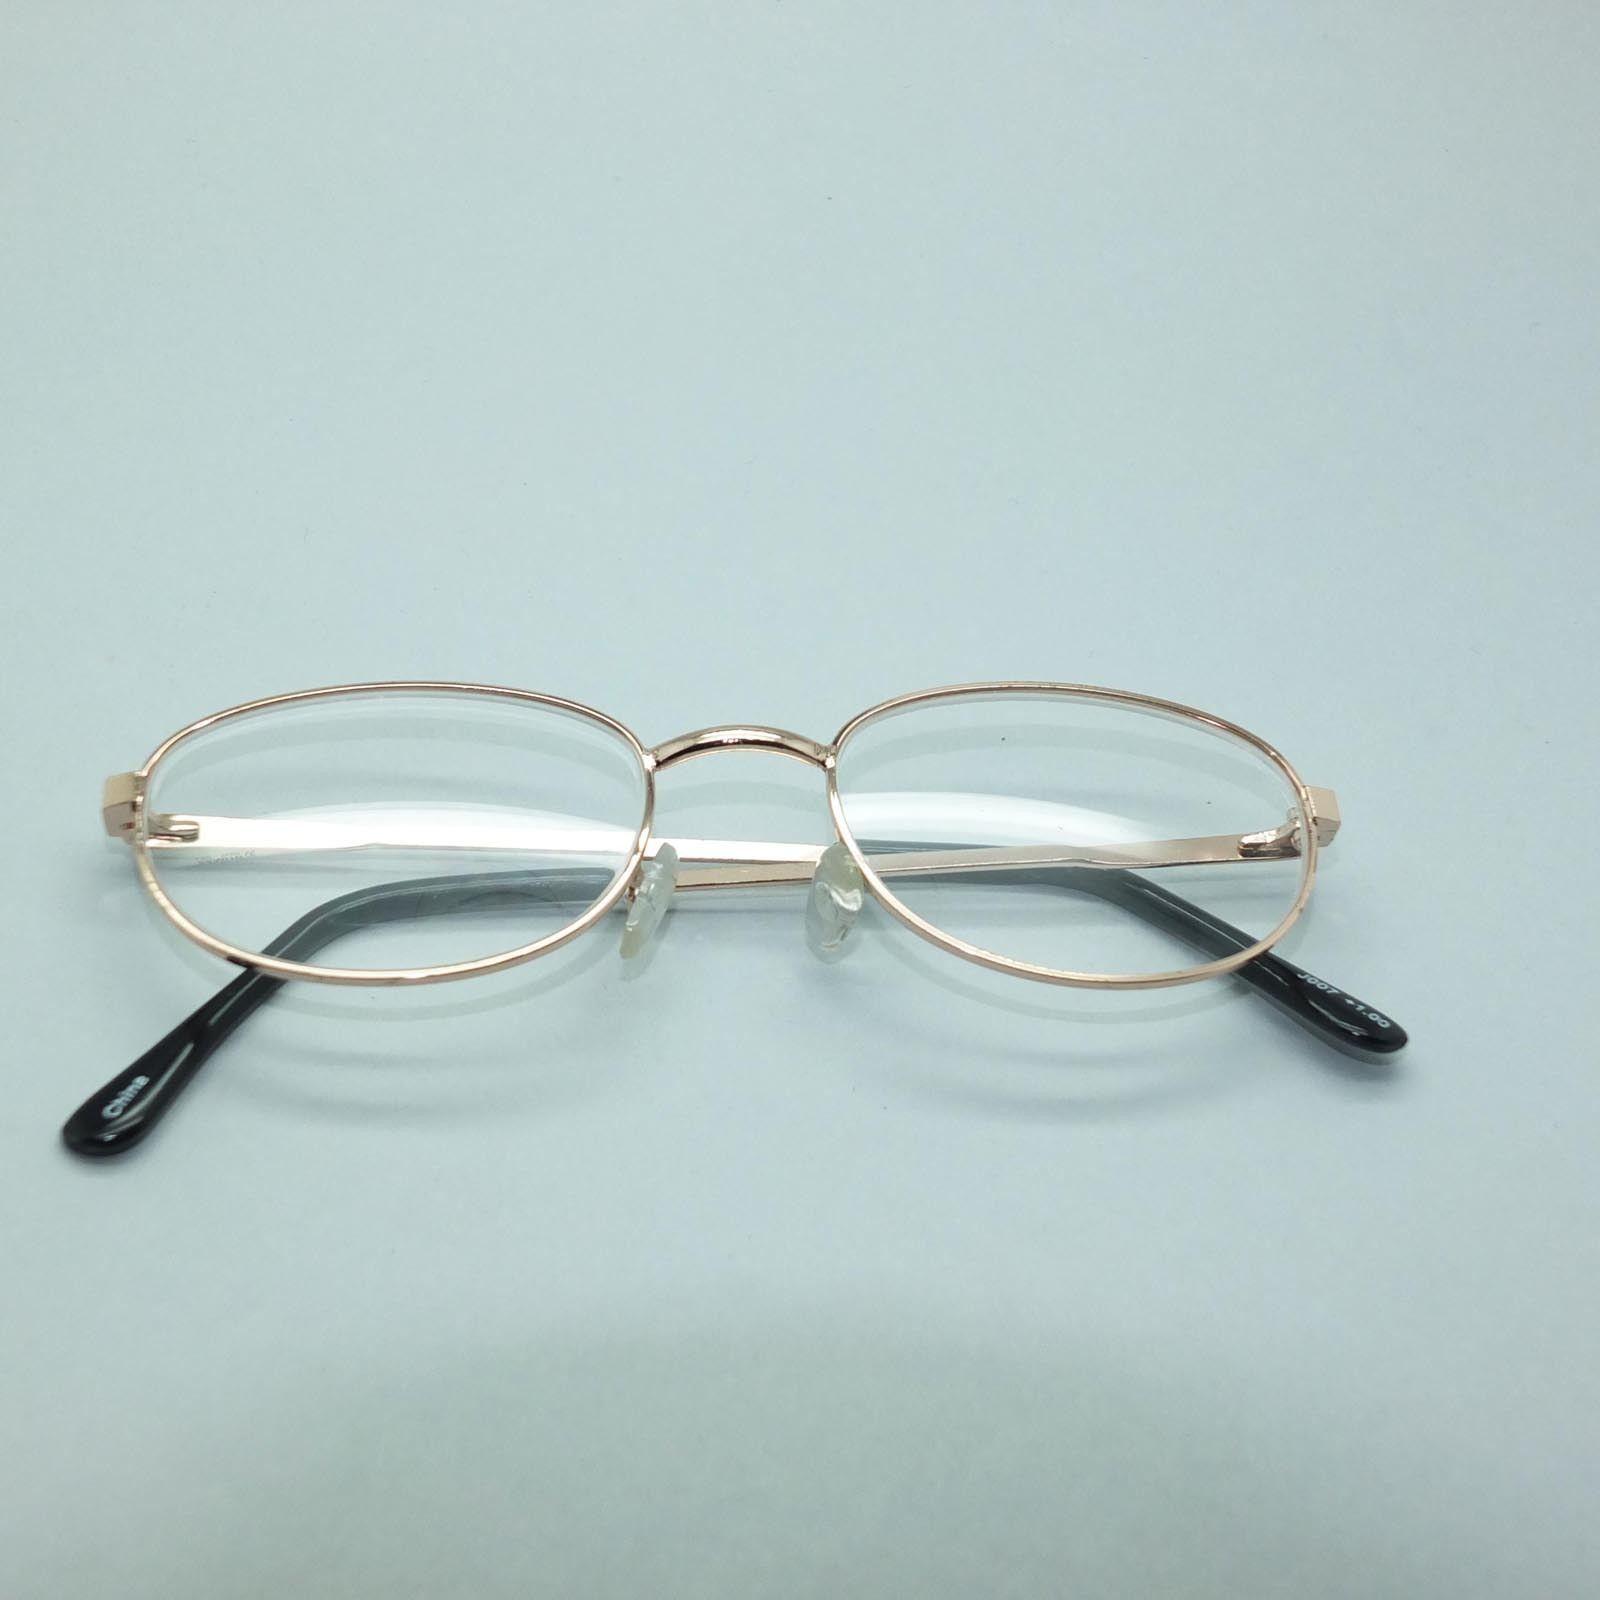 Reading Glasses Lightweight Gold Metal Frame Petite Oval +3.50 Lens